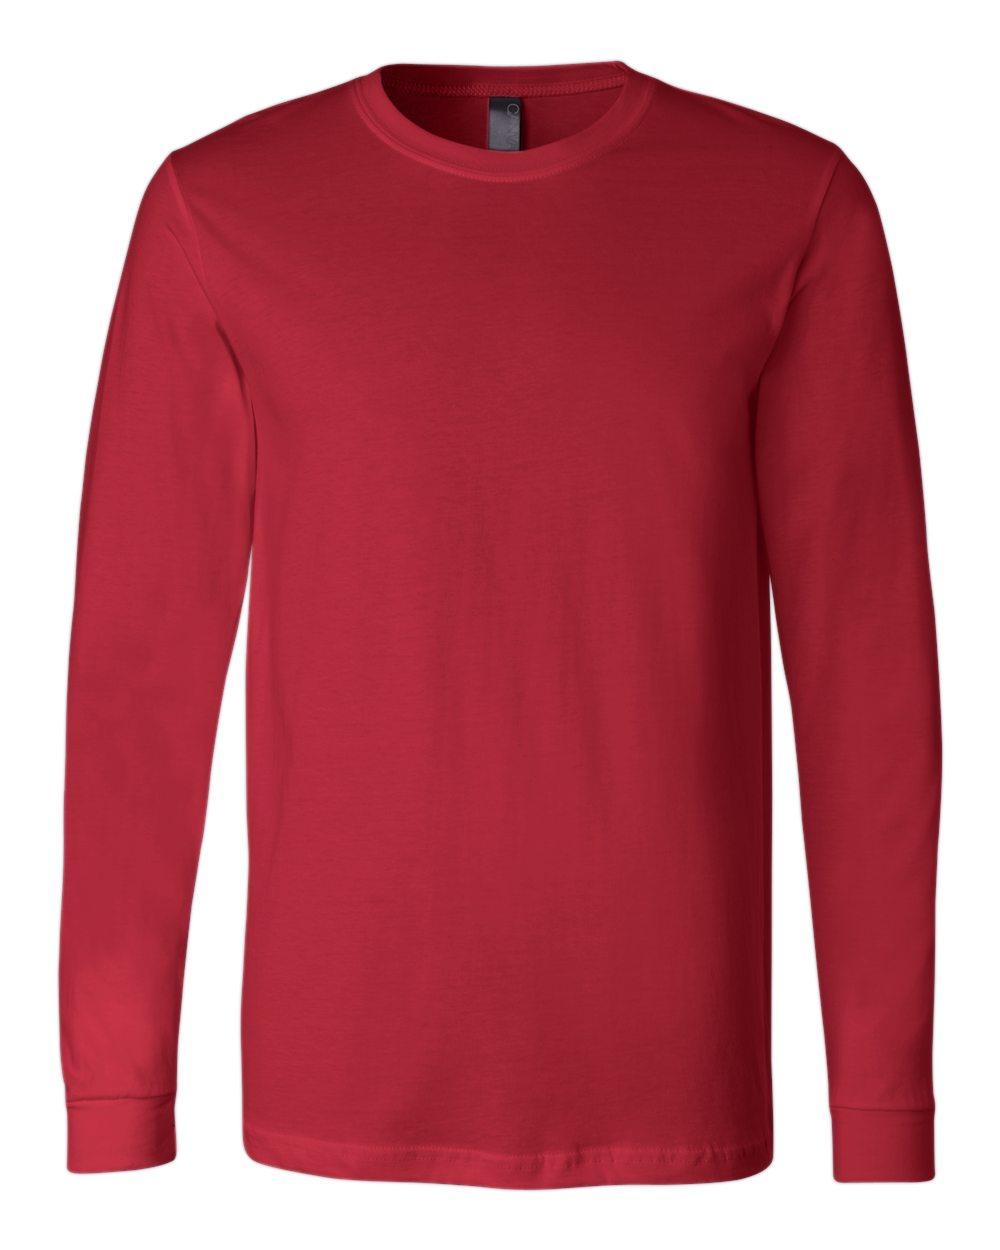 Bella-Canvas-Mens-Blank-Top-Long-Sleeve-Jersey-Tee-T-Shirt-3501-up-to-3XL thumbnail 97